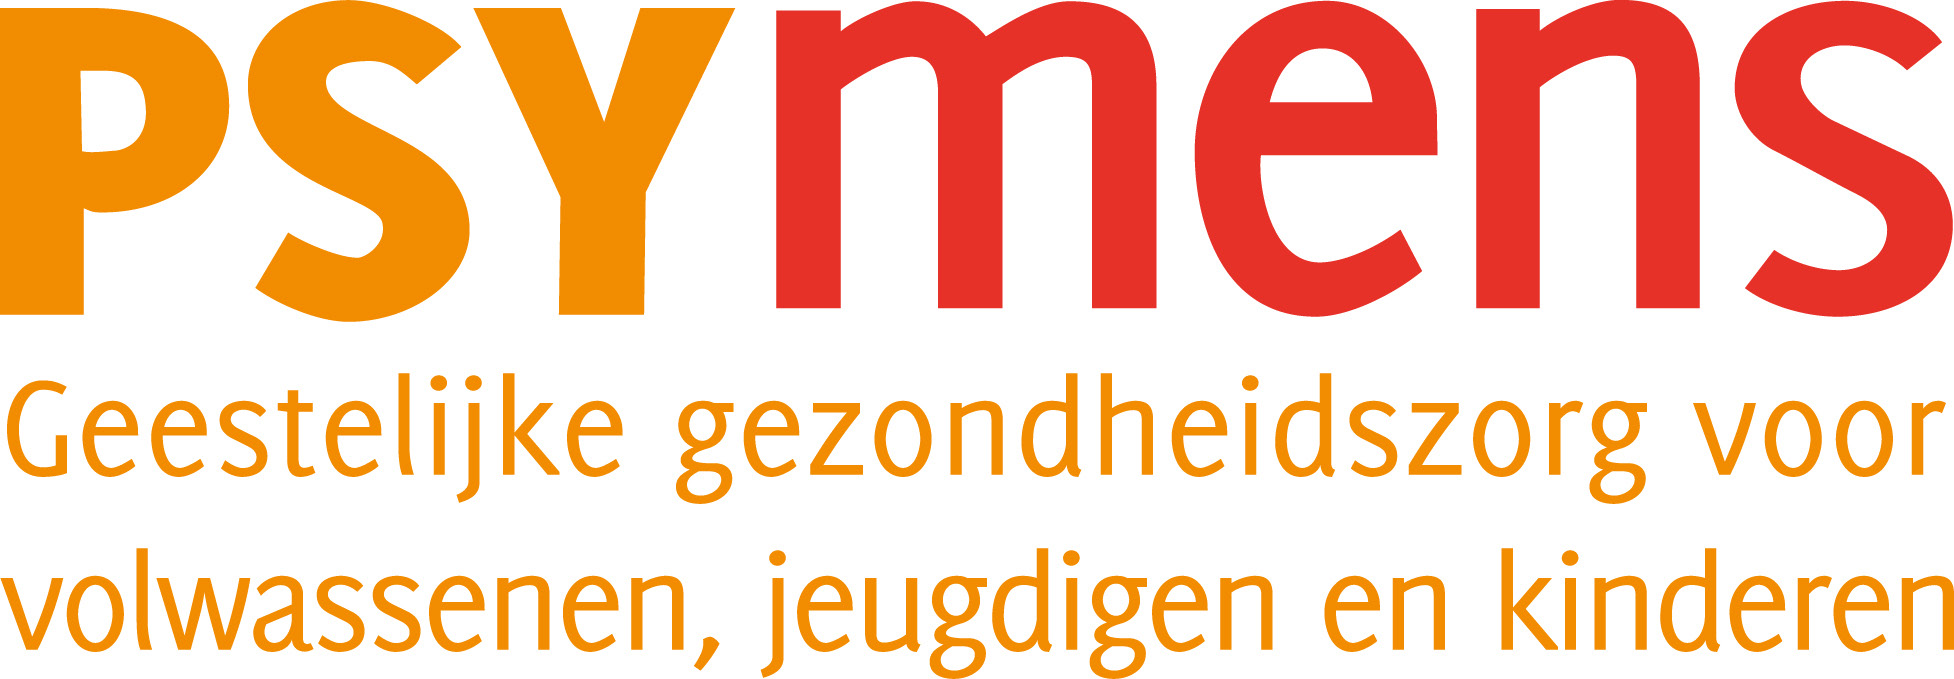 Psymens | Comenius GGZ